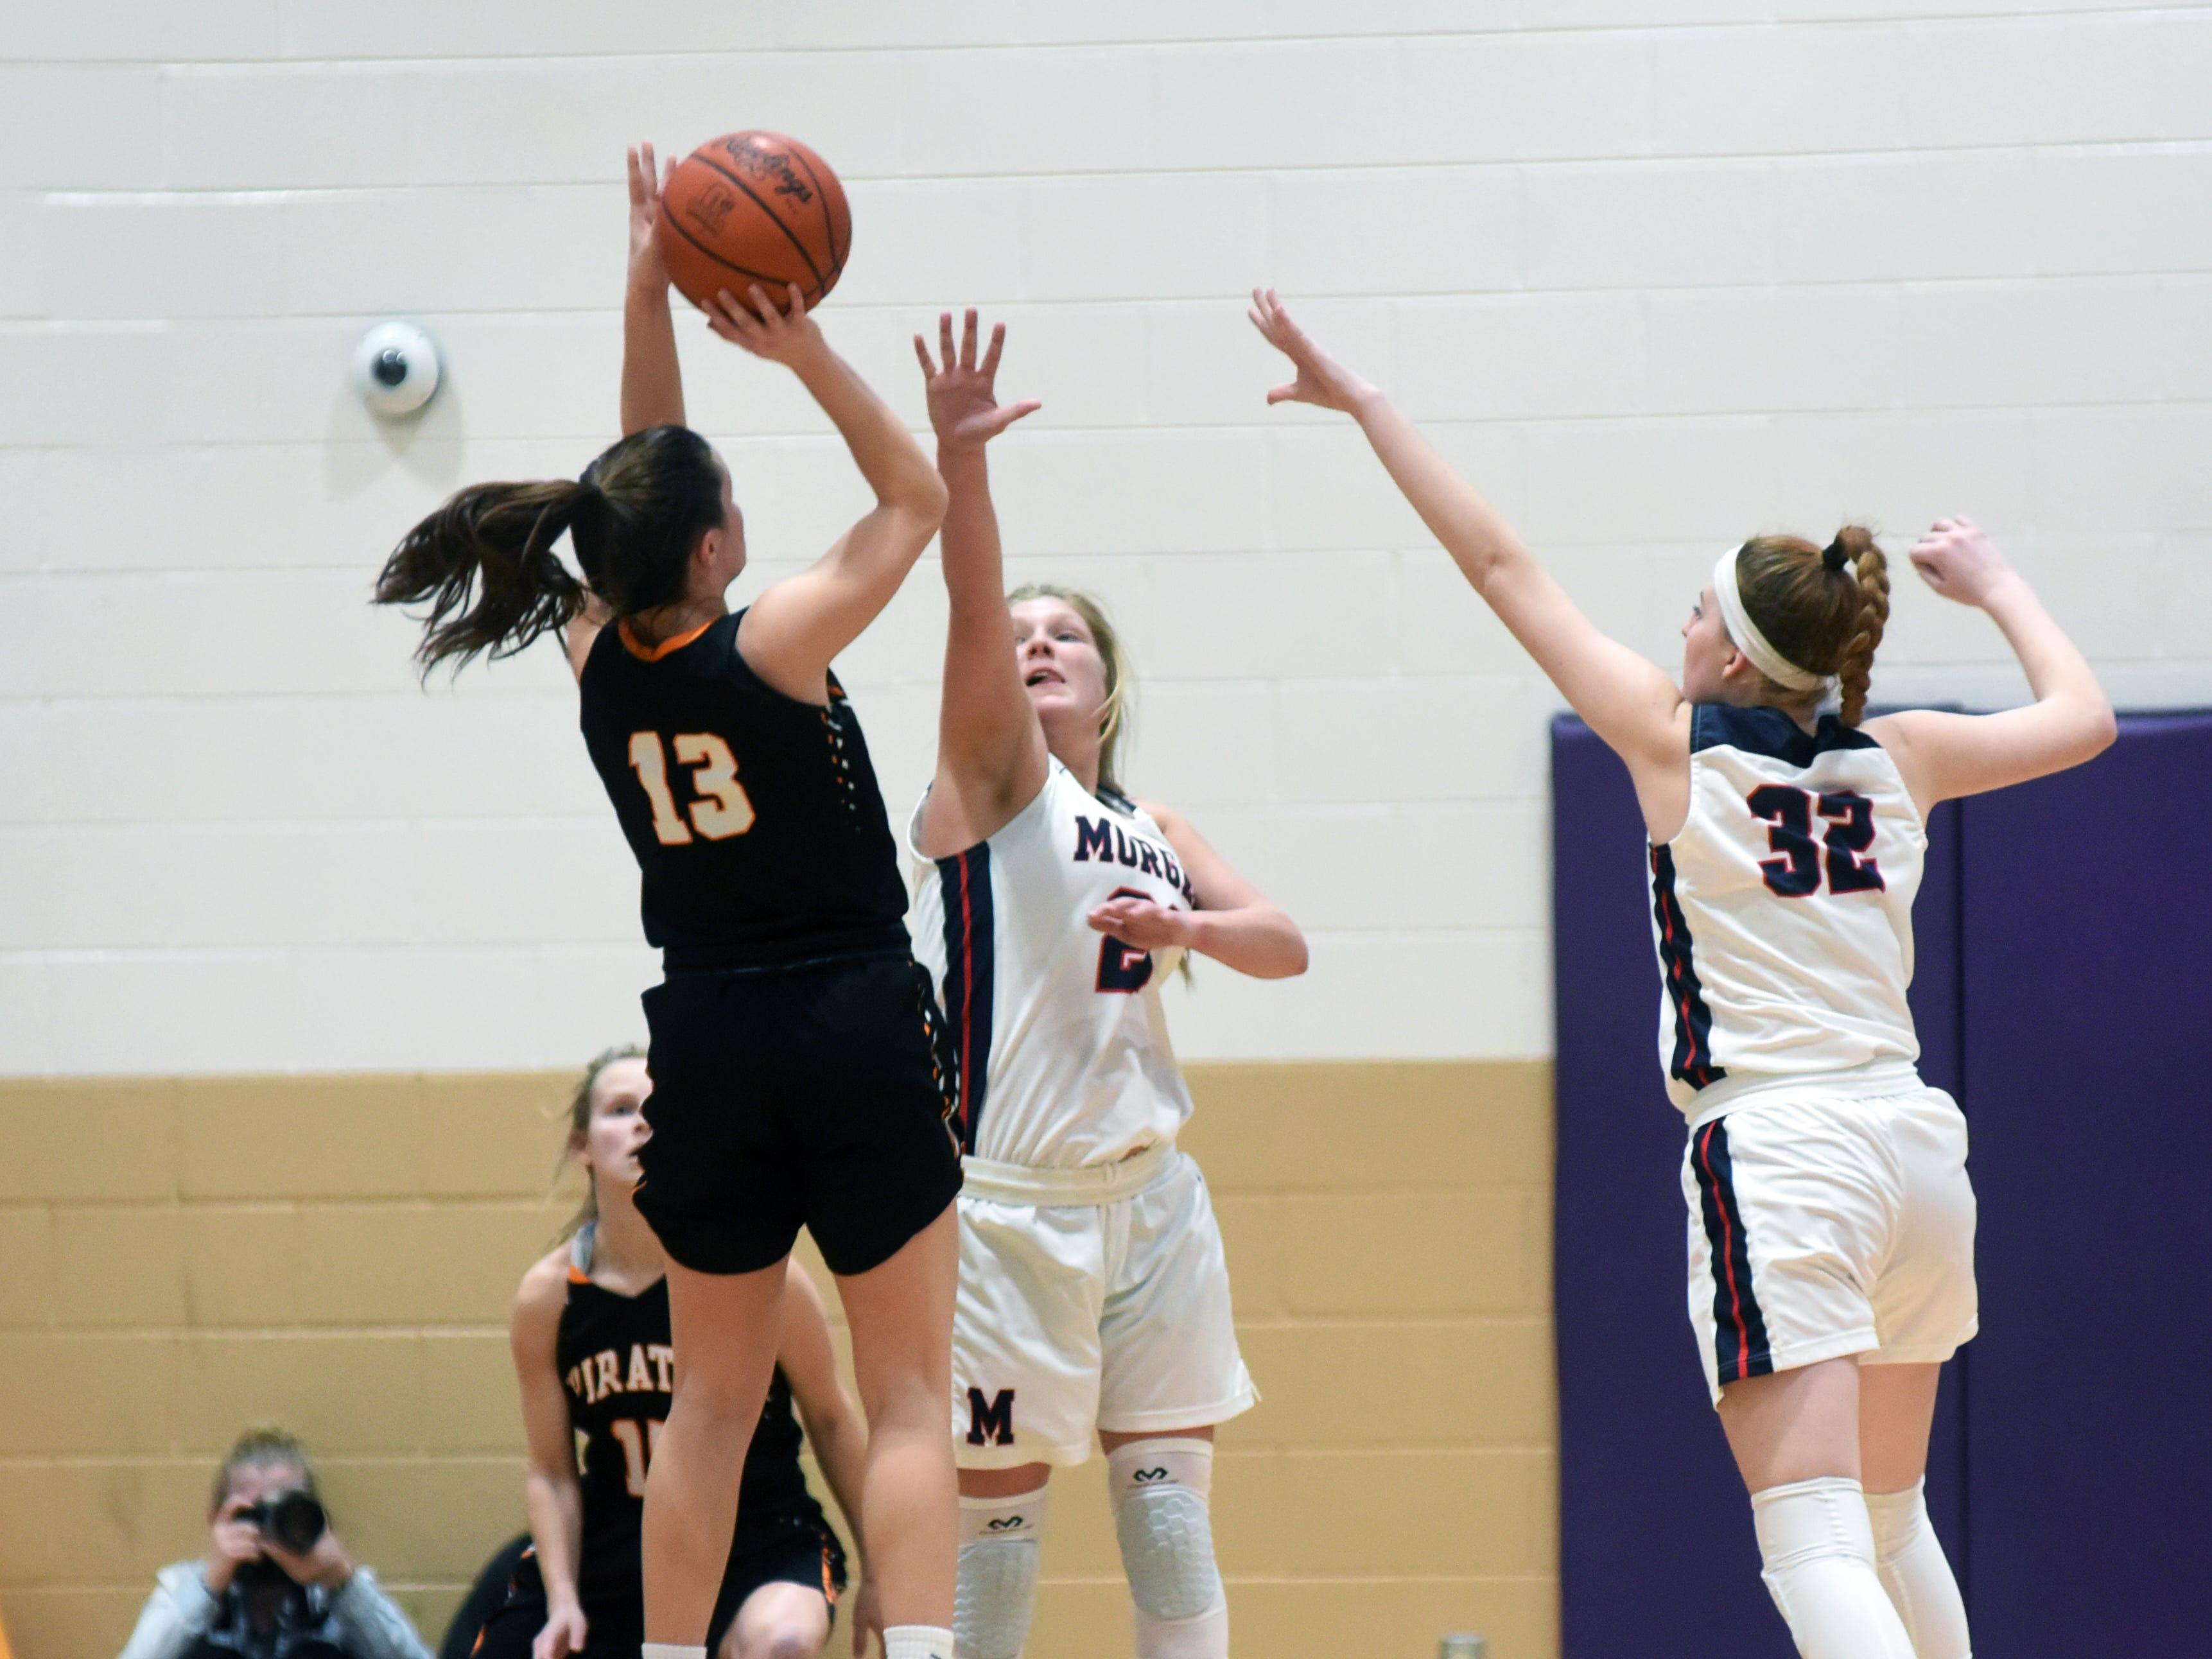 Kara Hopkins tries to block a shot during Morgan's 56-55 loss to Wheelersburg in a Division III regional semifinal at Logan.